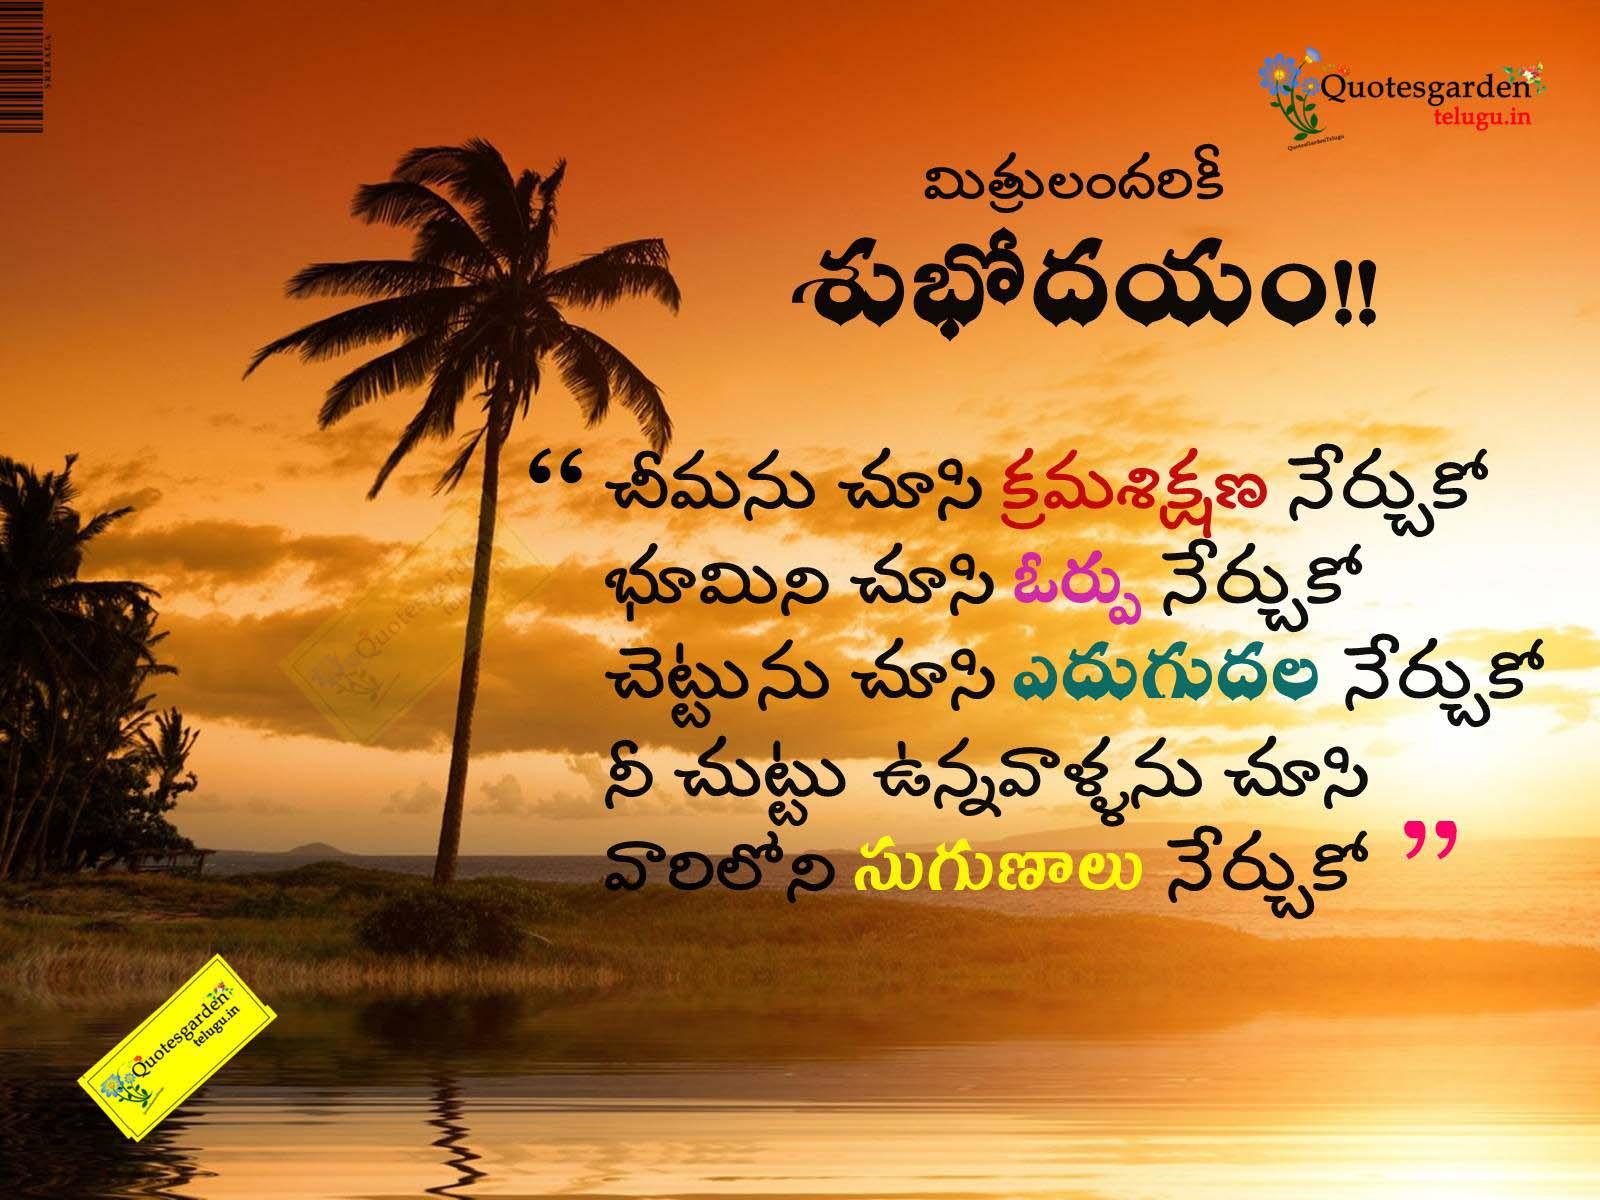 Telugu Quotes About Life Www Picsbud Com